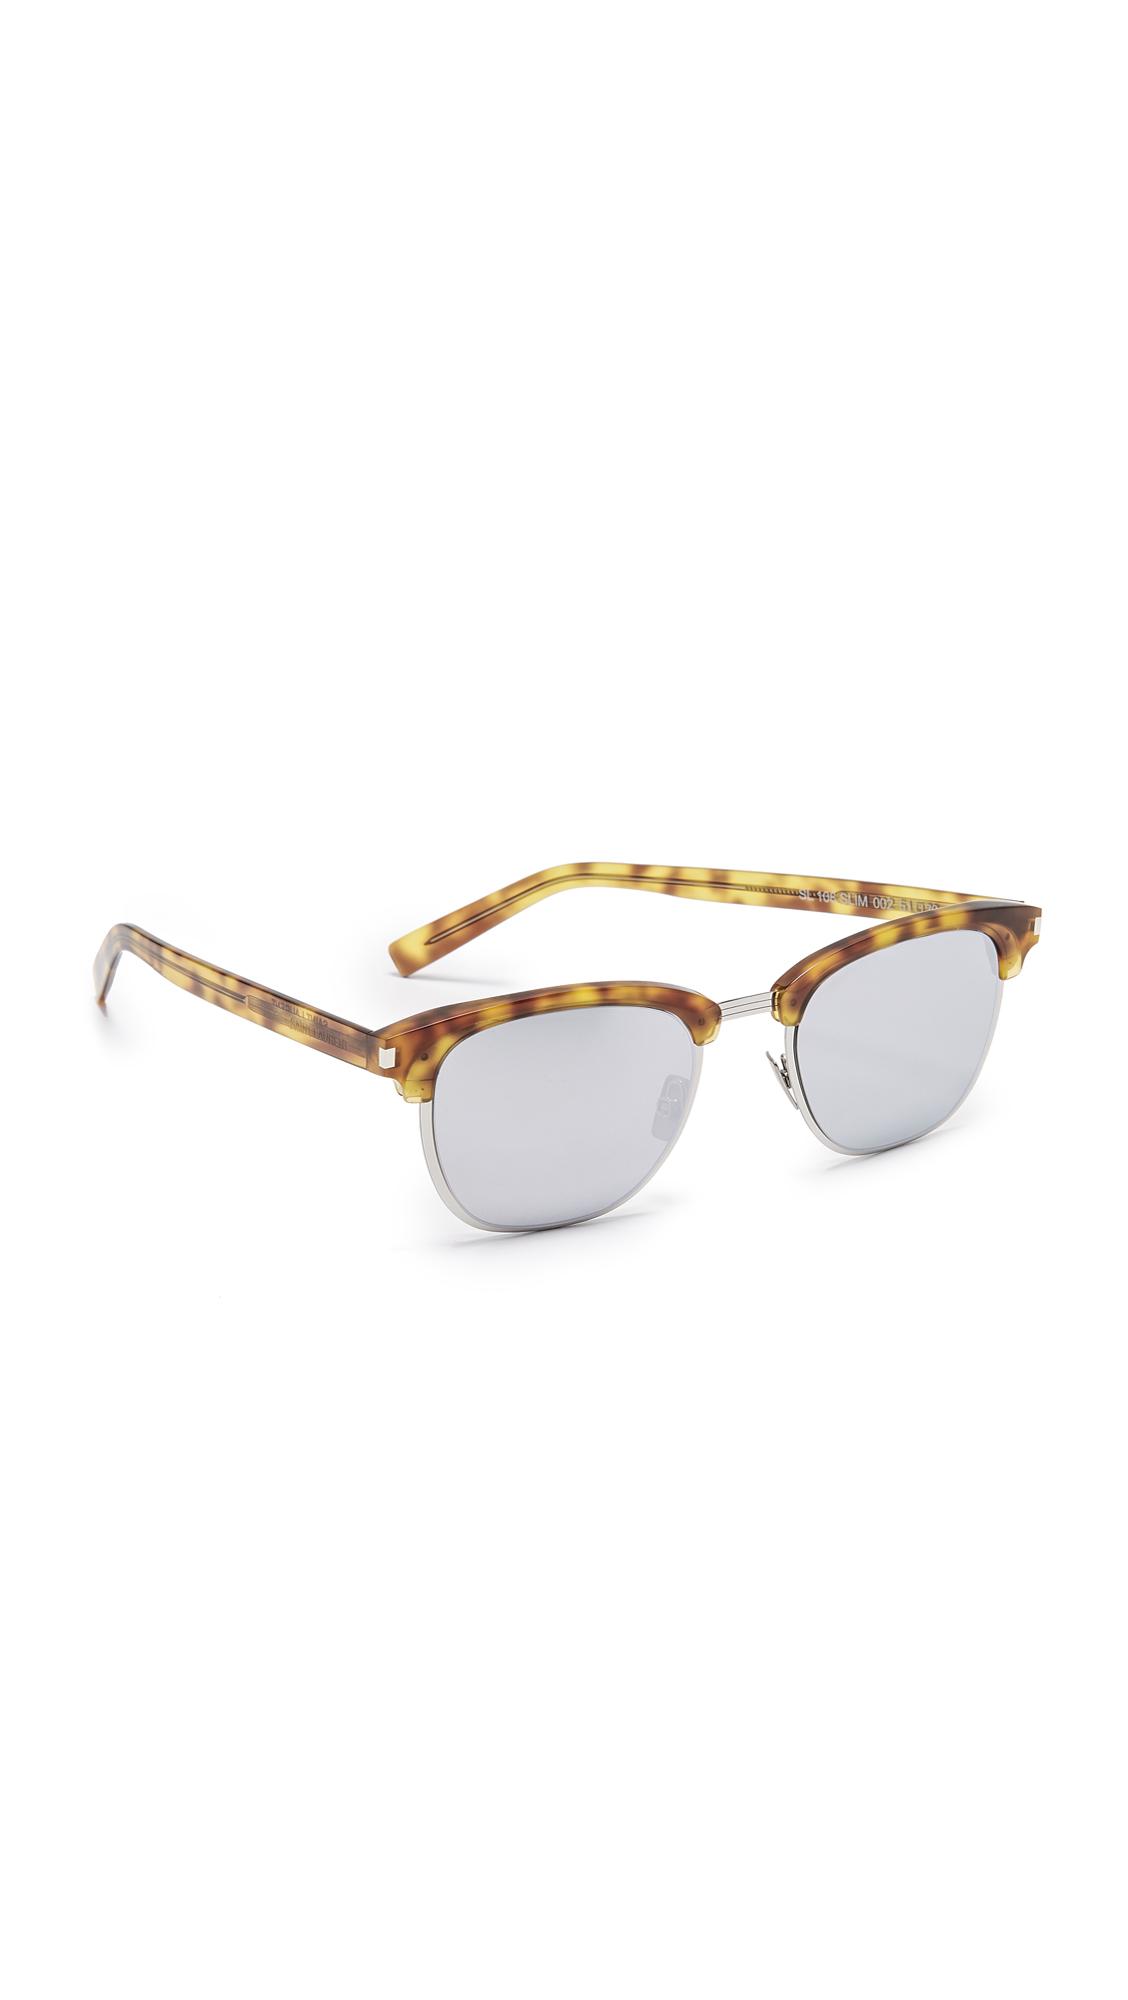 Saint Laurent SL 108 Slim Mirrored Sunglasses In Blonde Havana/Silver